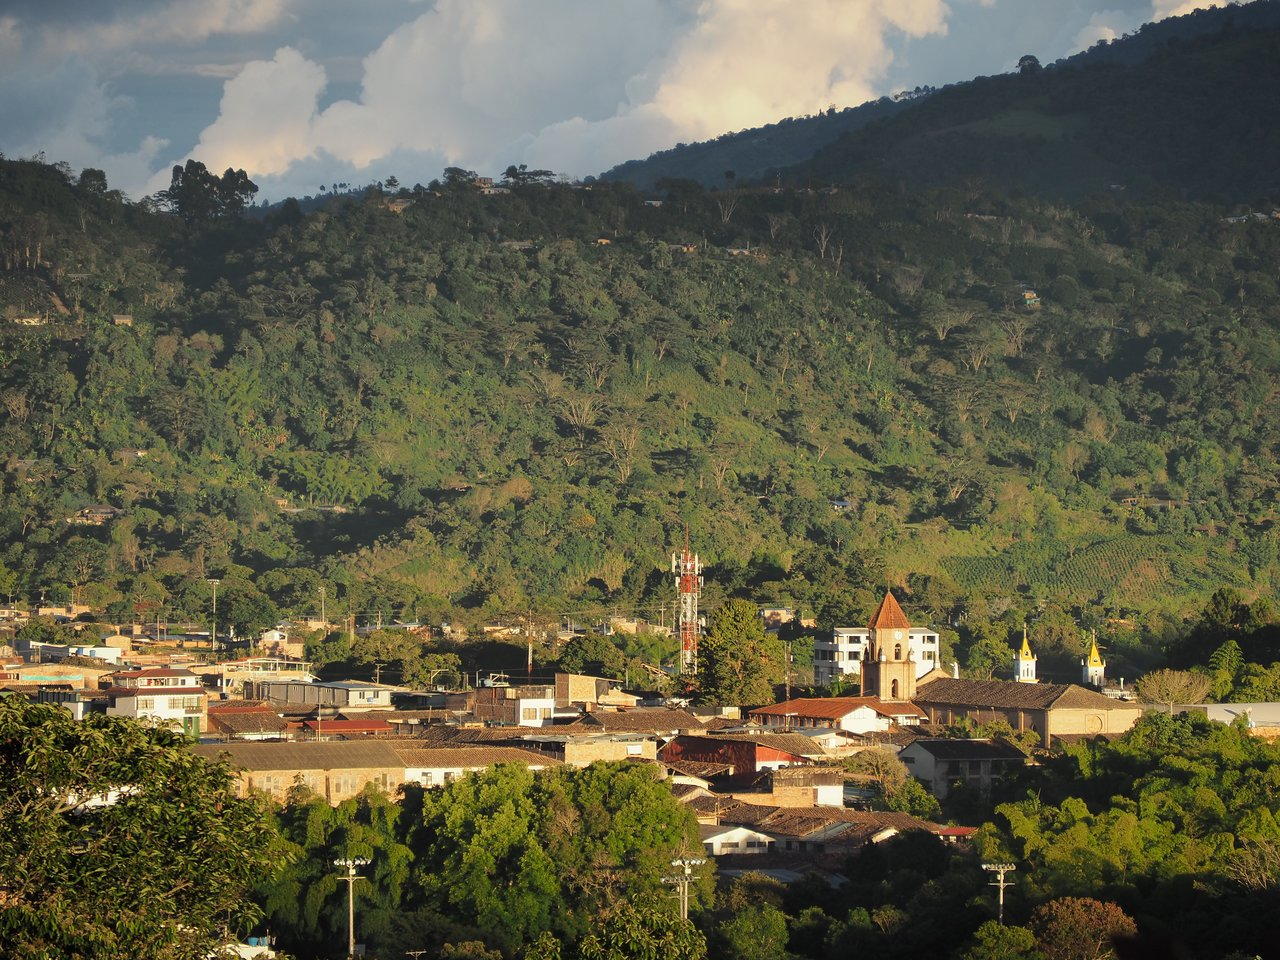 San Agustin | Photo taken by Peter G